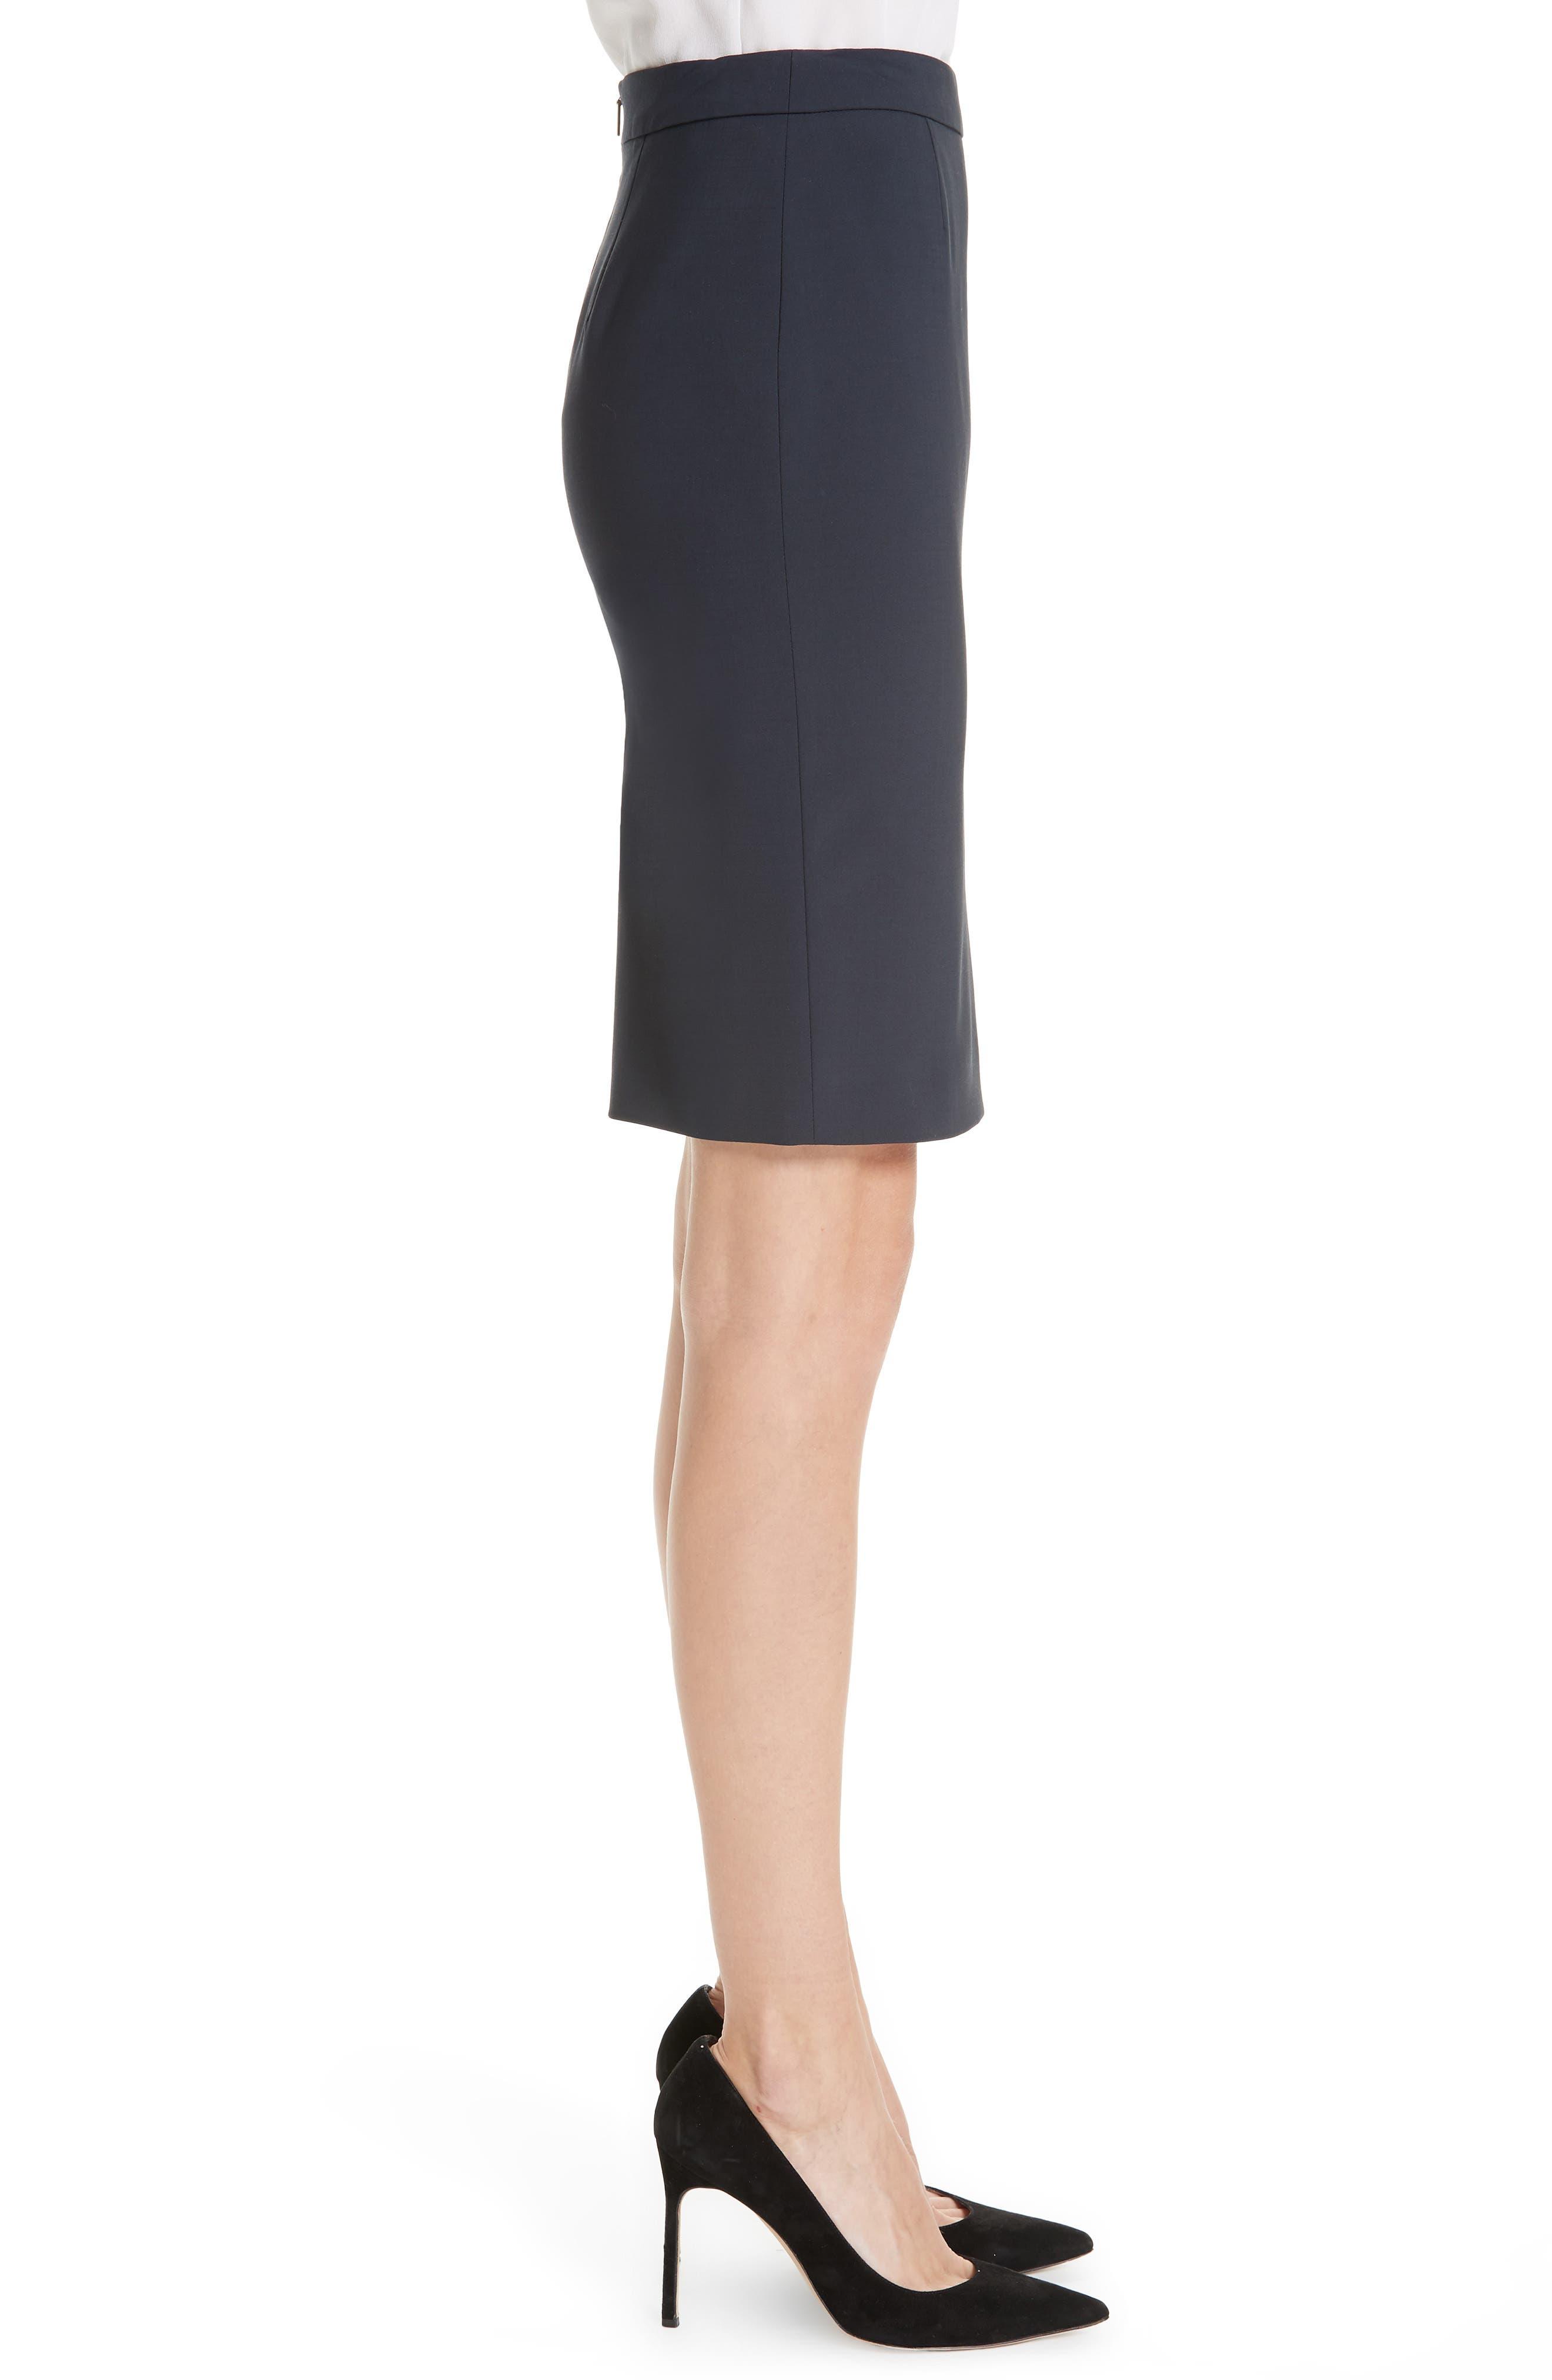 BOSS, Vilea Tropical Stretch Wool Pencil Skirt, Alternate thumbnail 3, color, NAVY